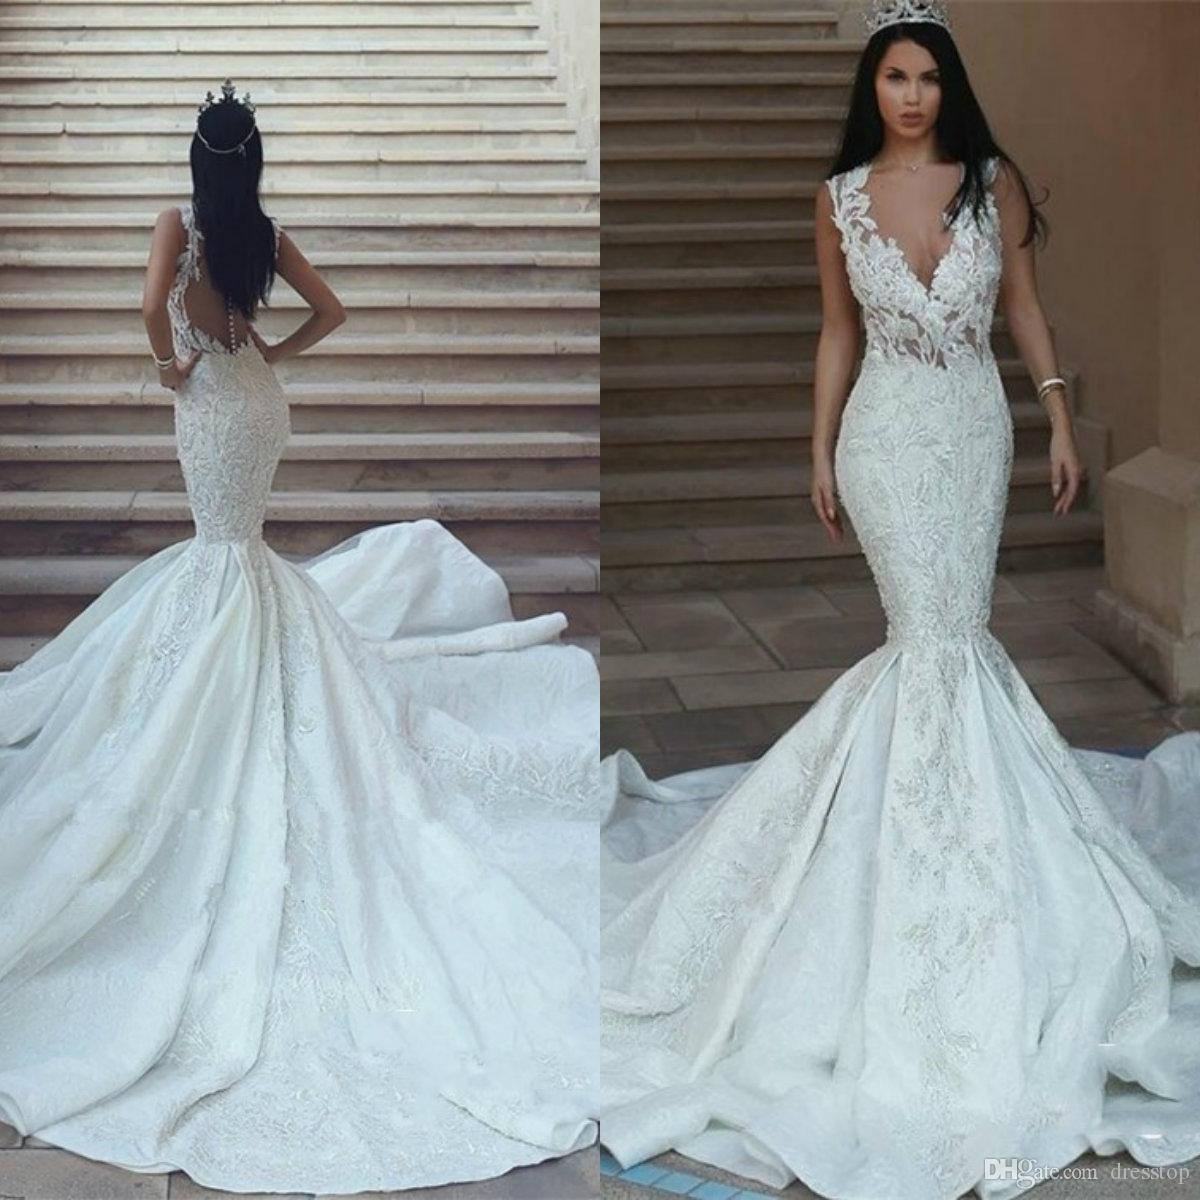 V Neck Vintage Mermaid Wedding Dresses Sleeveless Lace Appliqued Satin Sweep Train Bridal Gowns Beaded Sheer Buttons Back robes de mariée